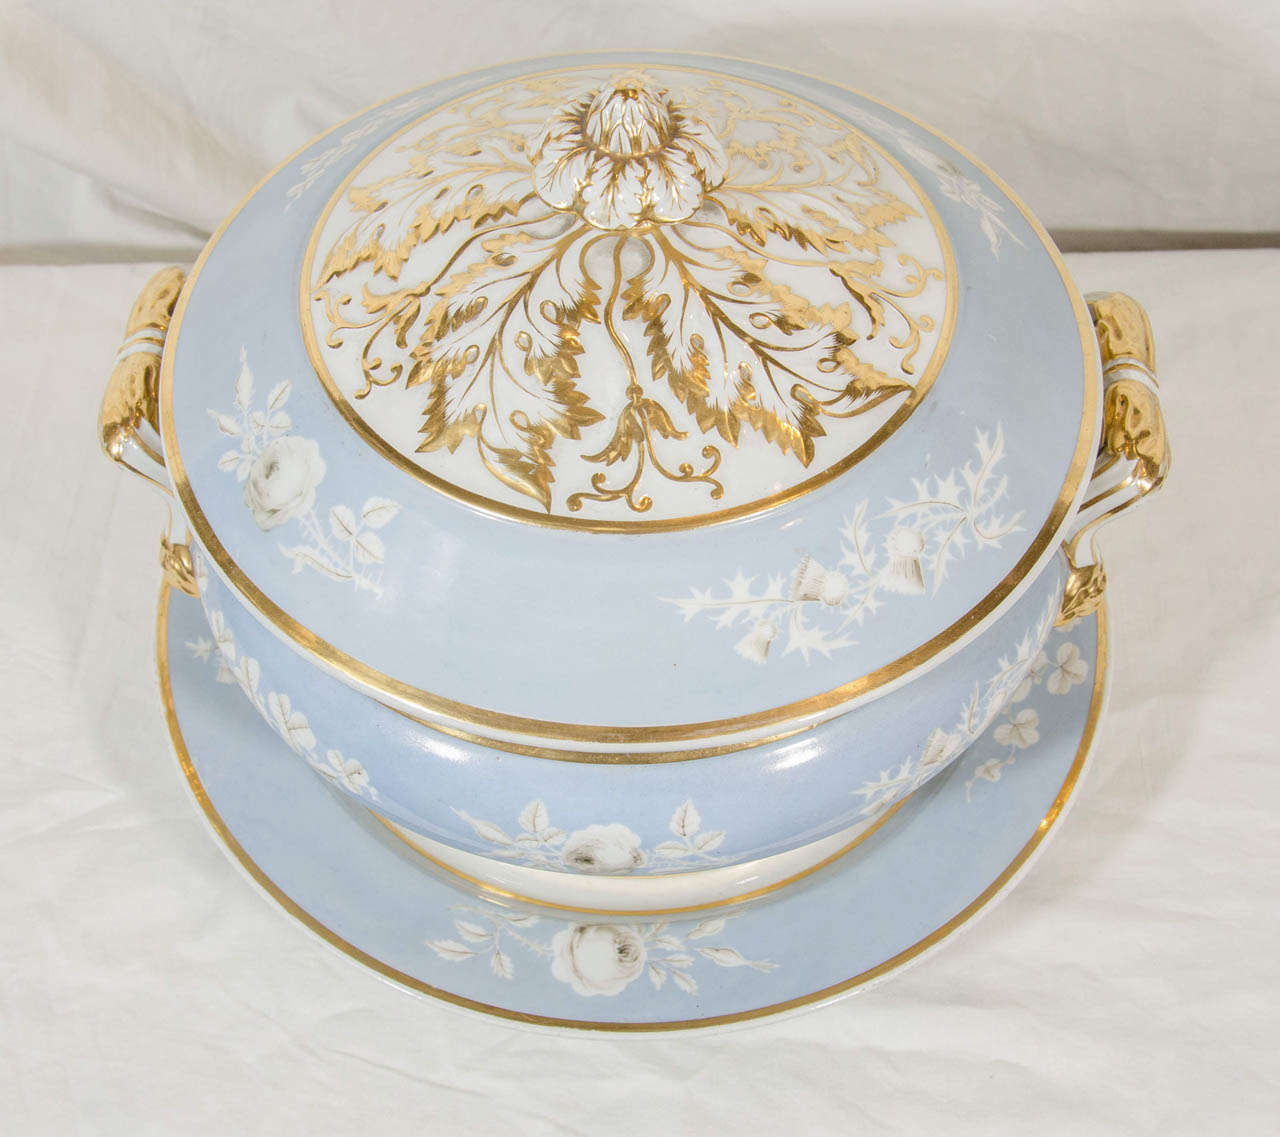 Antique Porcelain Blue Worcester Soup Tureen For Sale 1